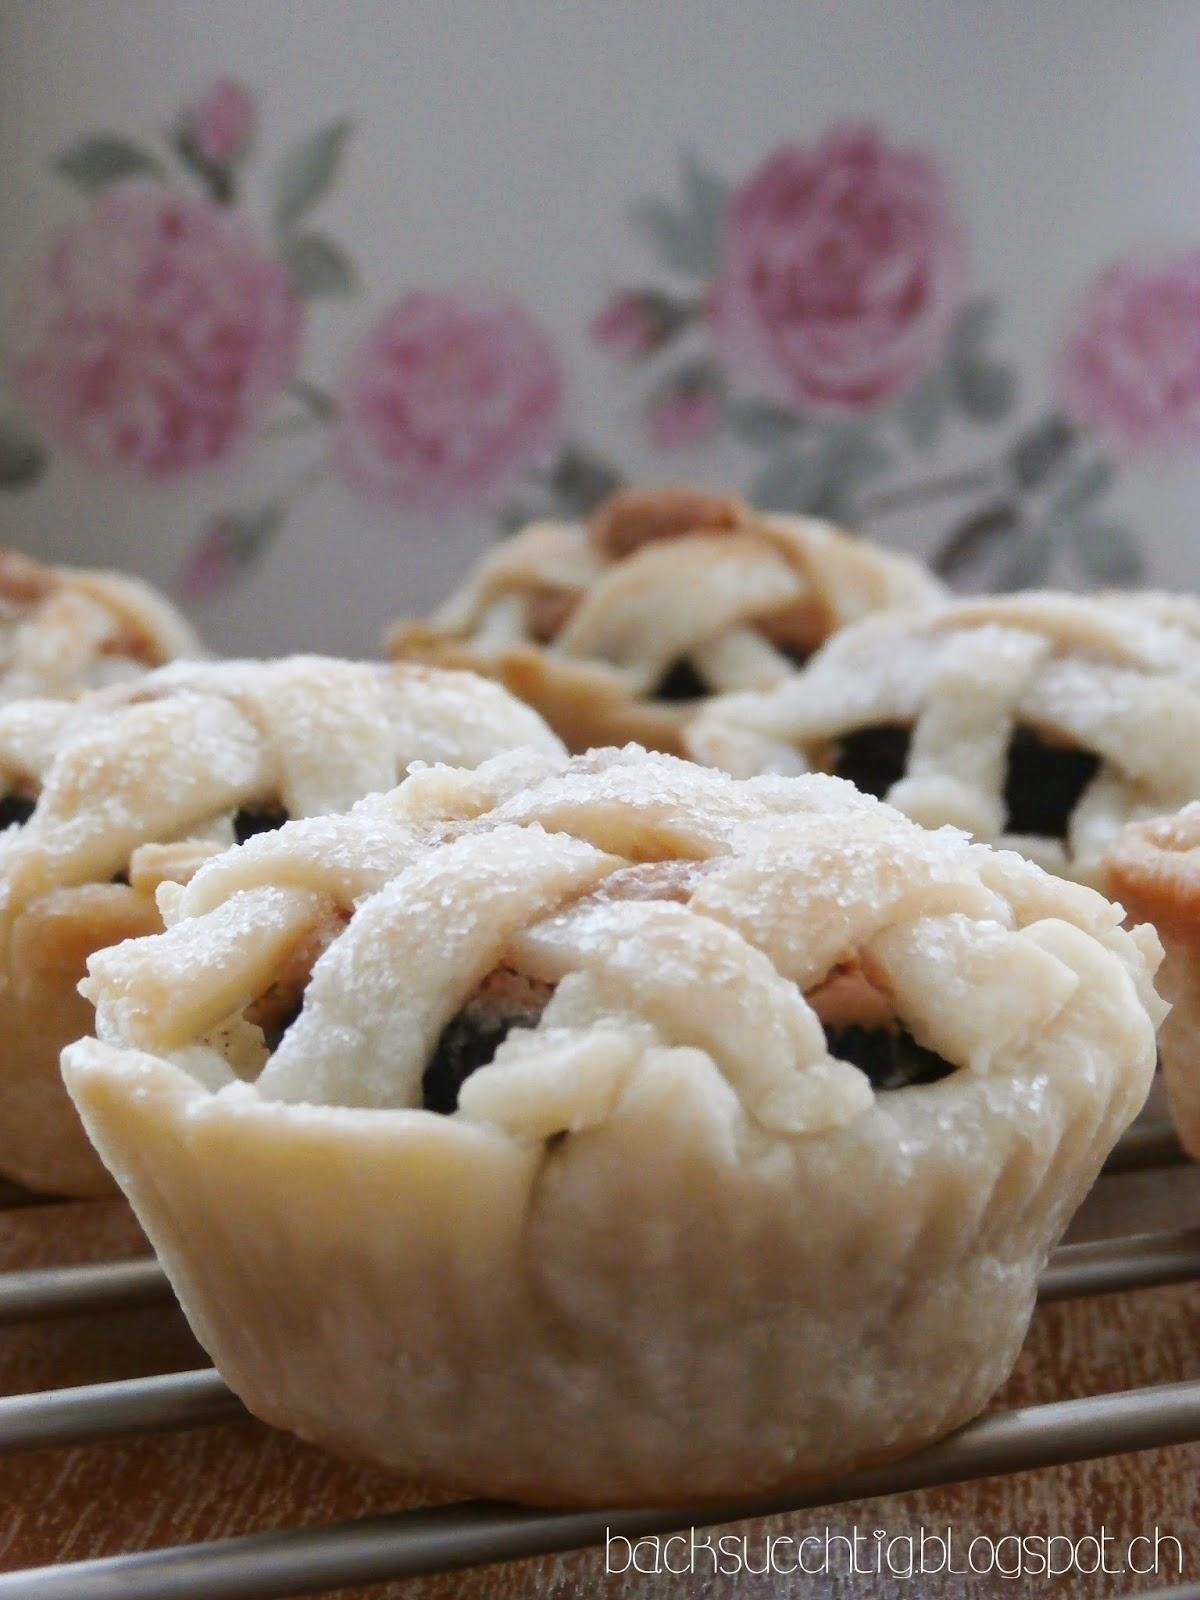 backsüchtig: Oreo and Peanut Butter Layered Baby Lattice Pies